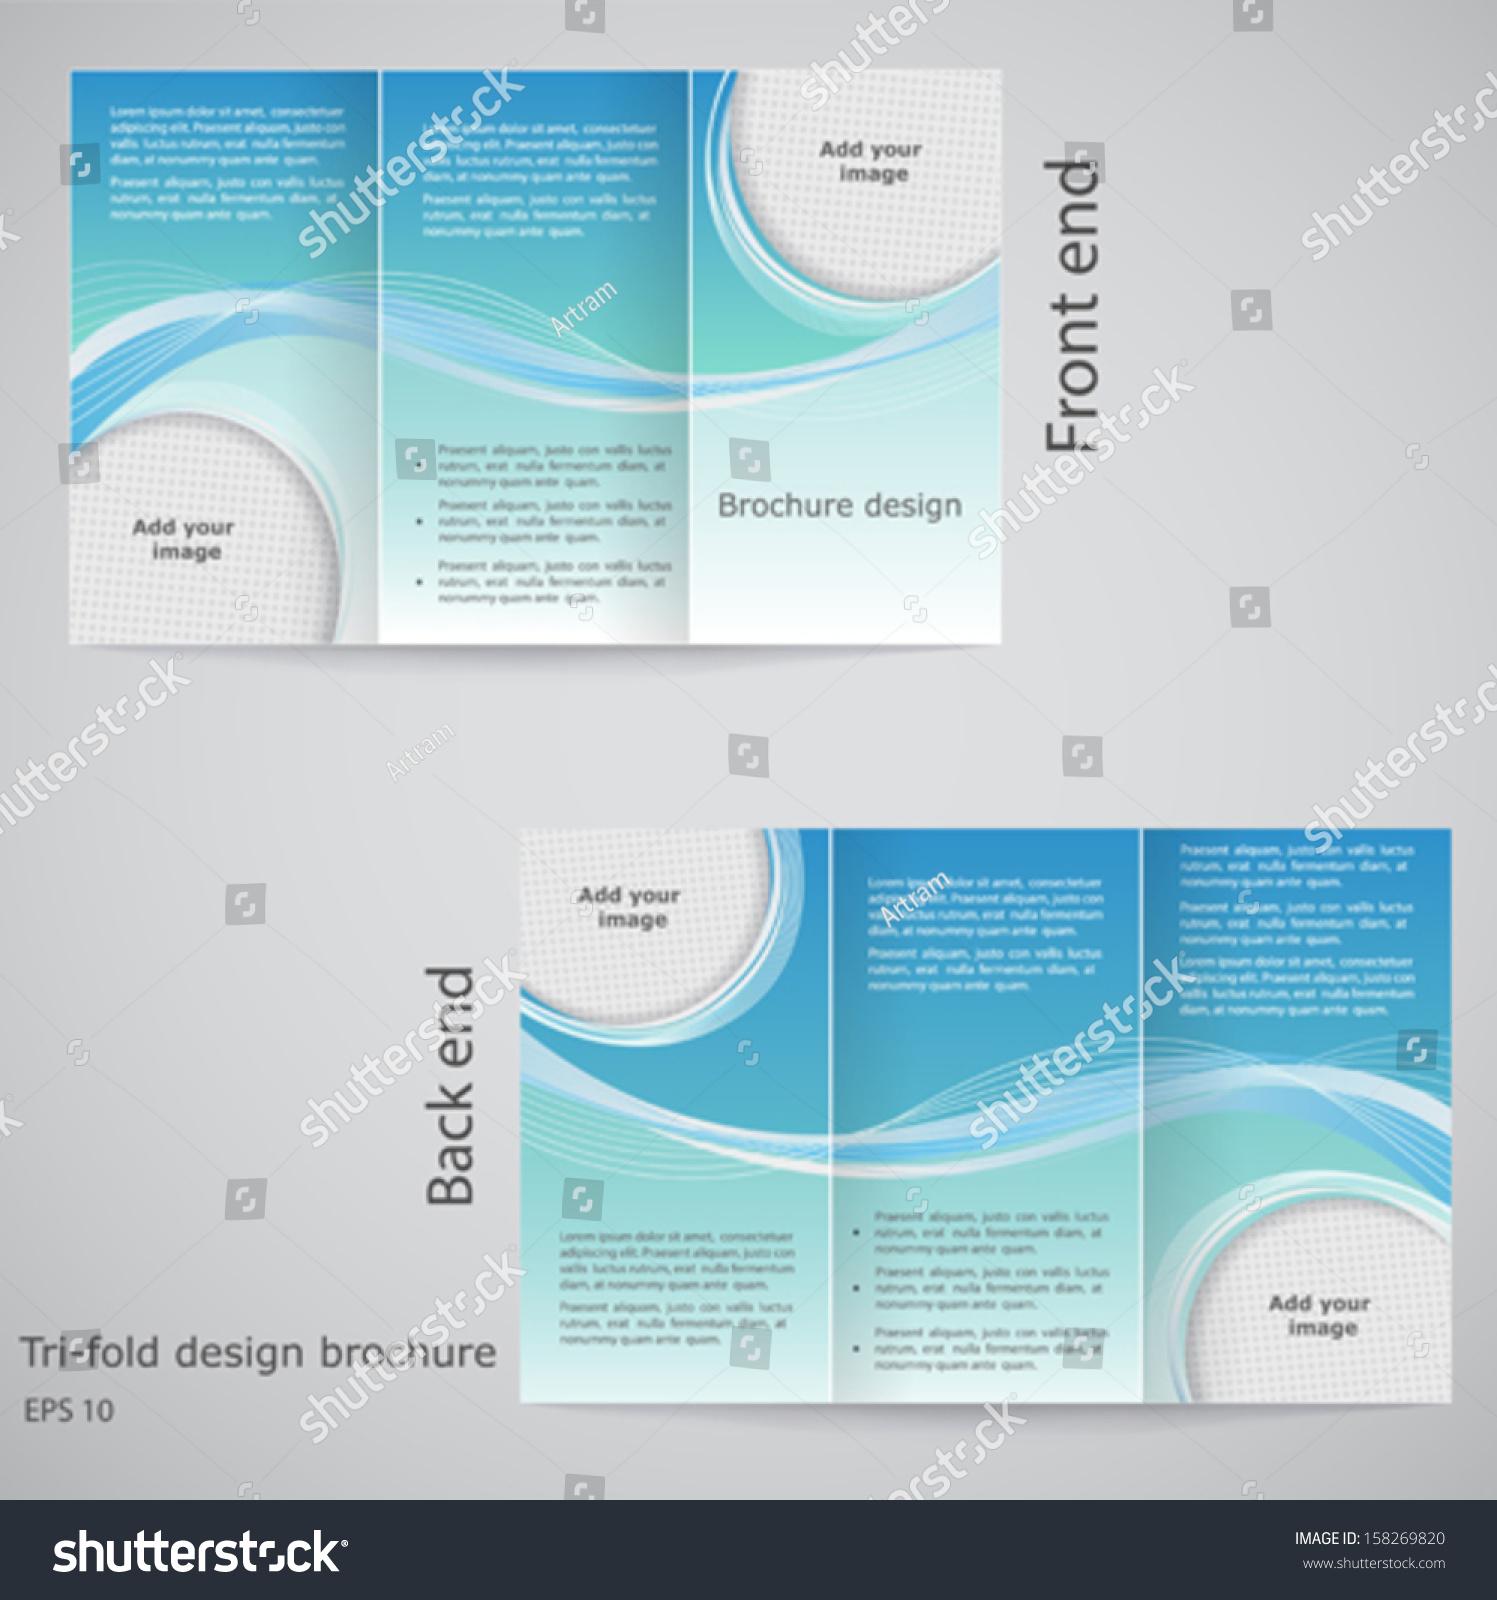 Trifold Brochure Design Brochure Template Design Stock Vector - Folding brochure template